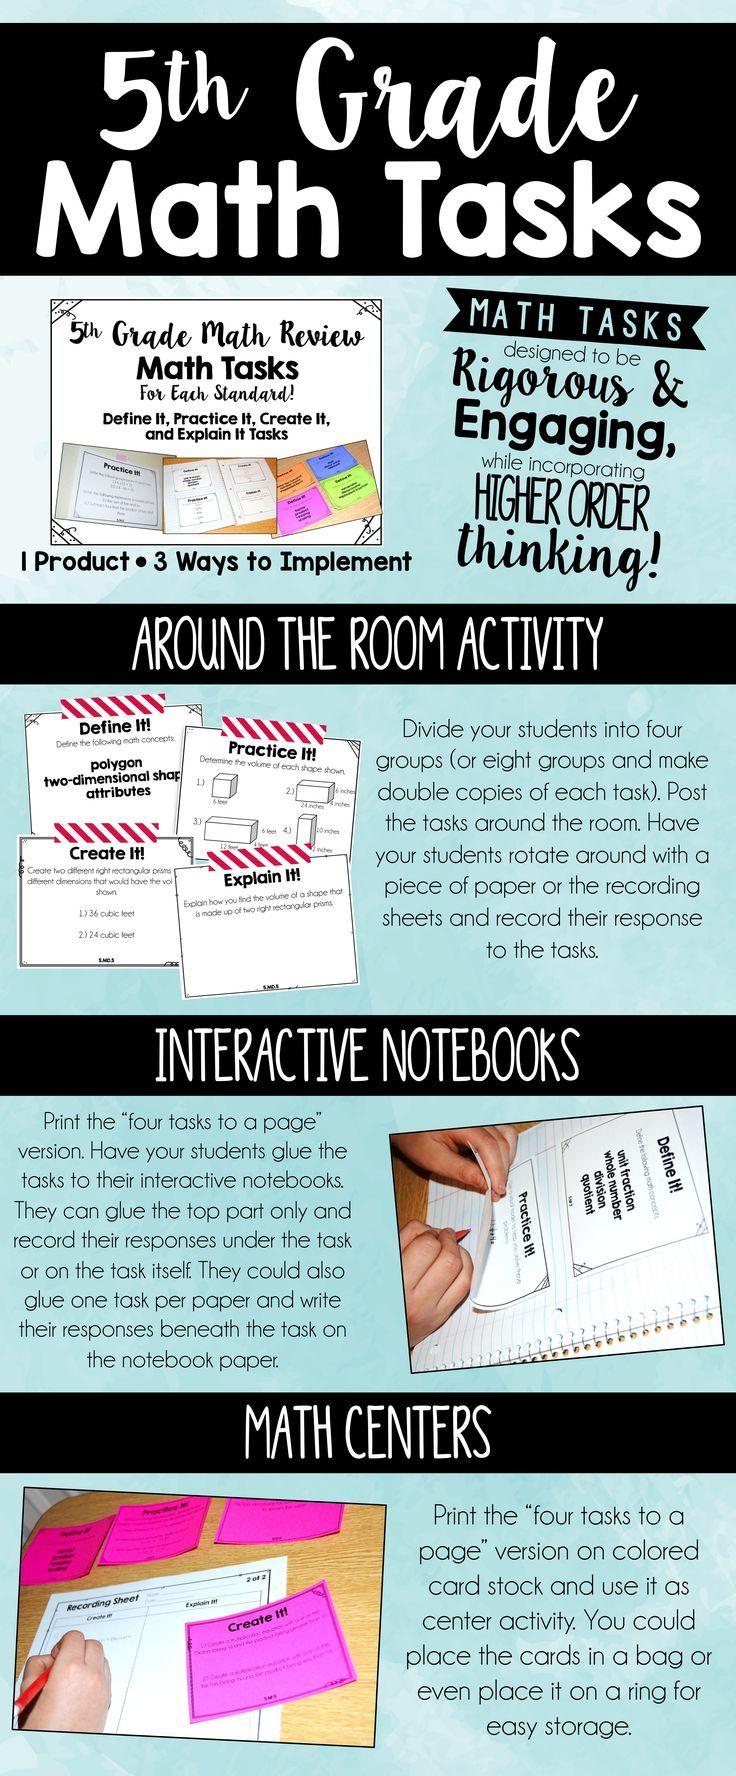 5th Grade Math Review Tasks | 5th Grade Math | Pinterest | Common ...